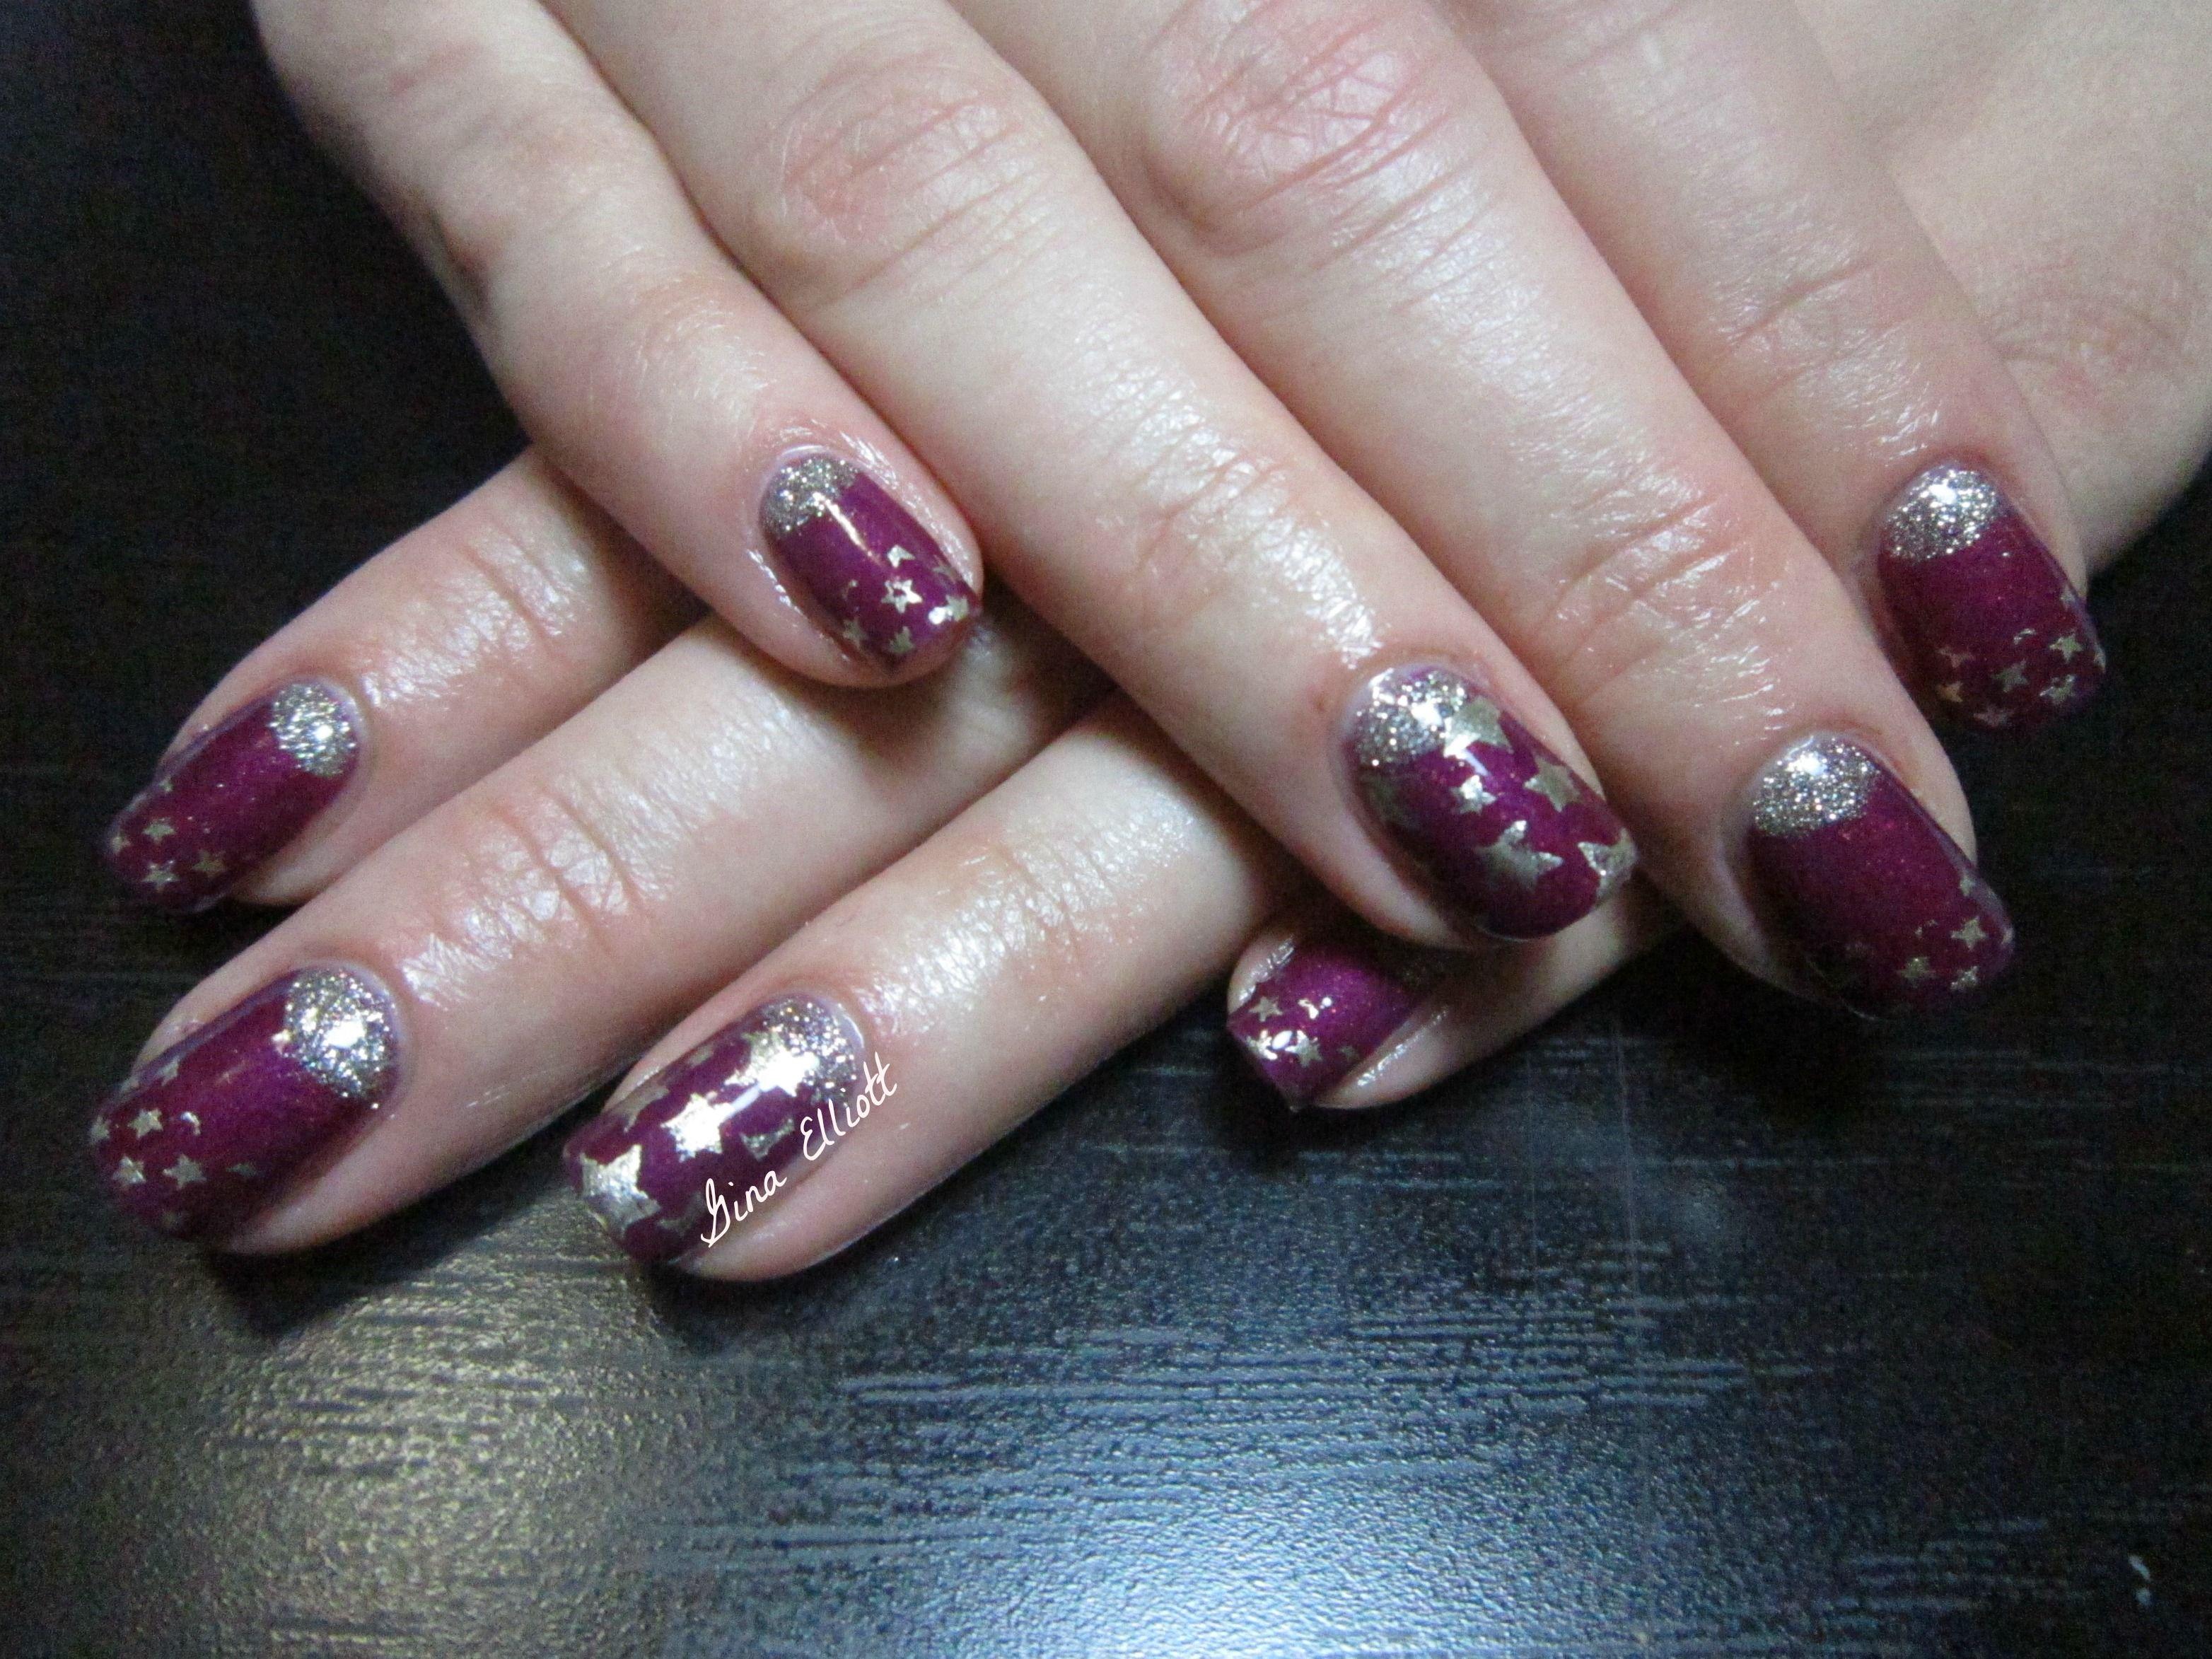 www.facebook.com/beurbanangel purple & gold, gel polish, stars, half moon, party nails